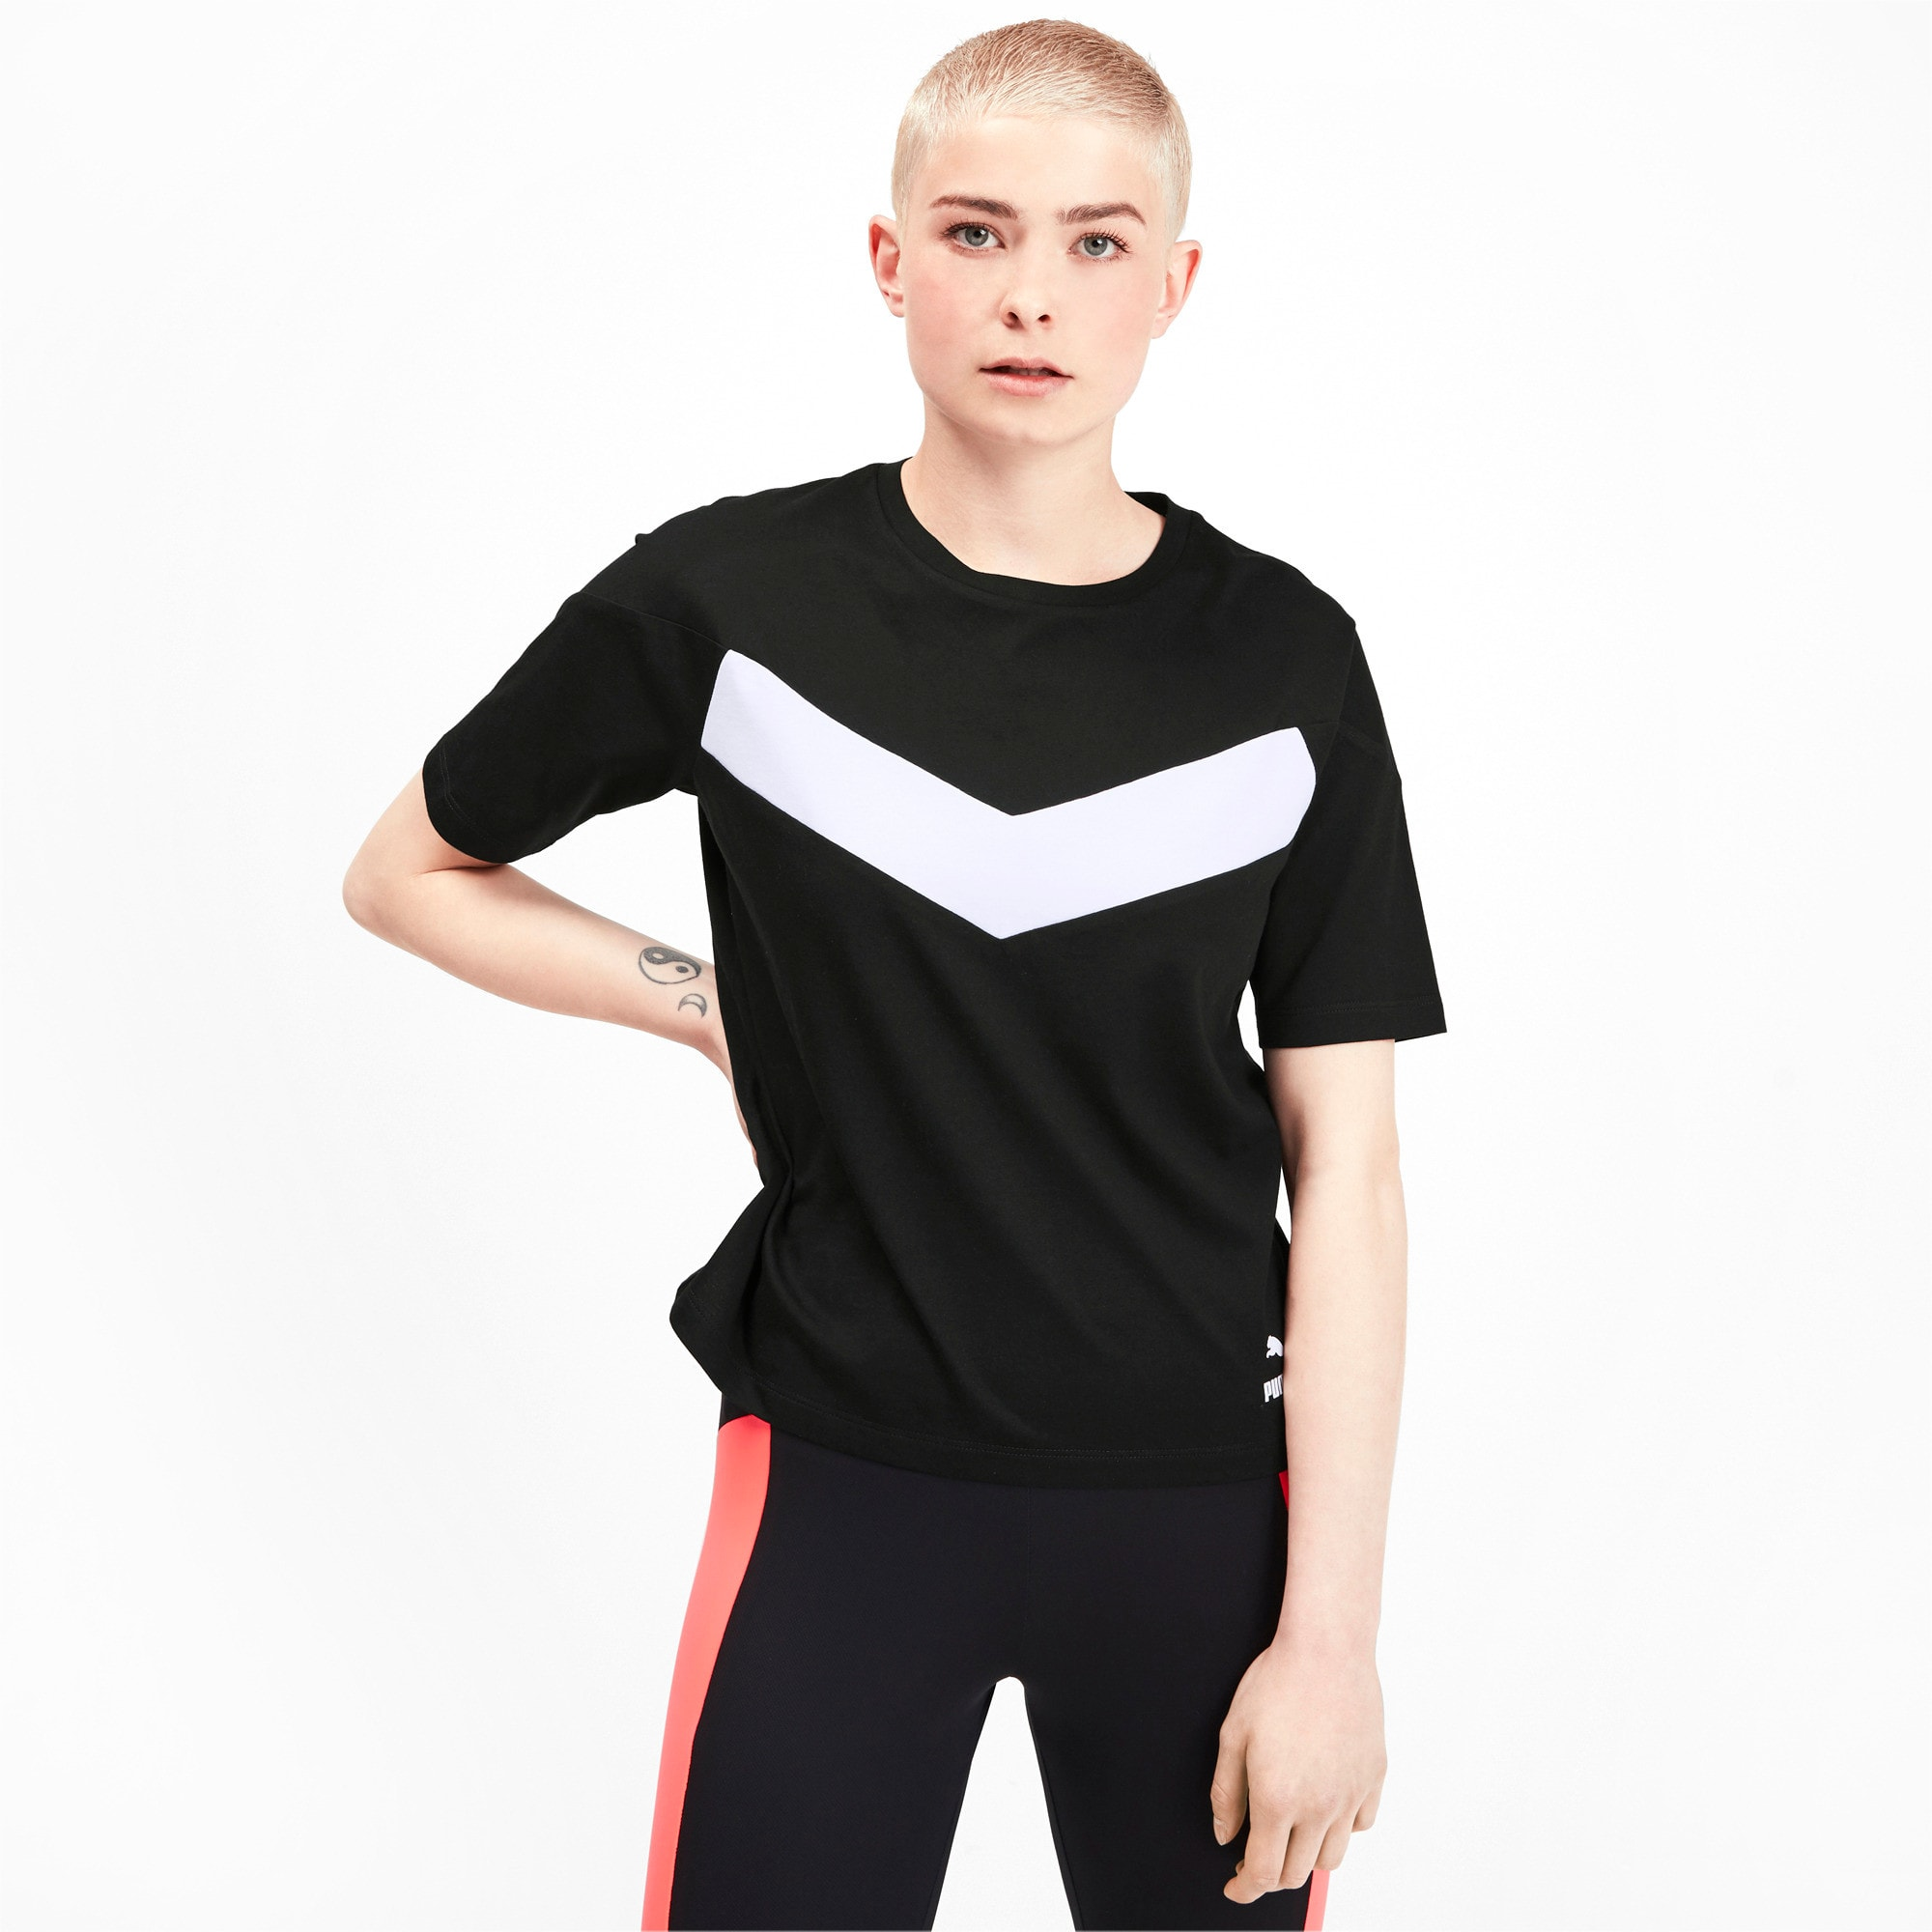 Thumbnail 1 of プーマ XTG ウィメンズ CB SS Tシャツ 半袖, Puma Black, medium-JPN